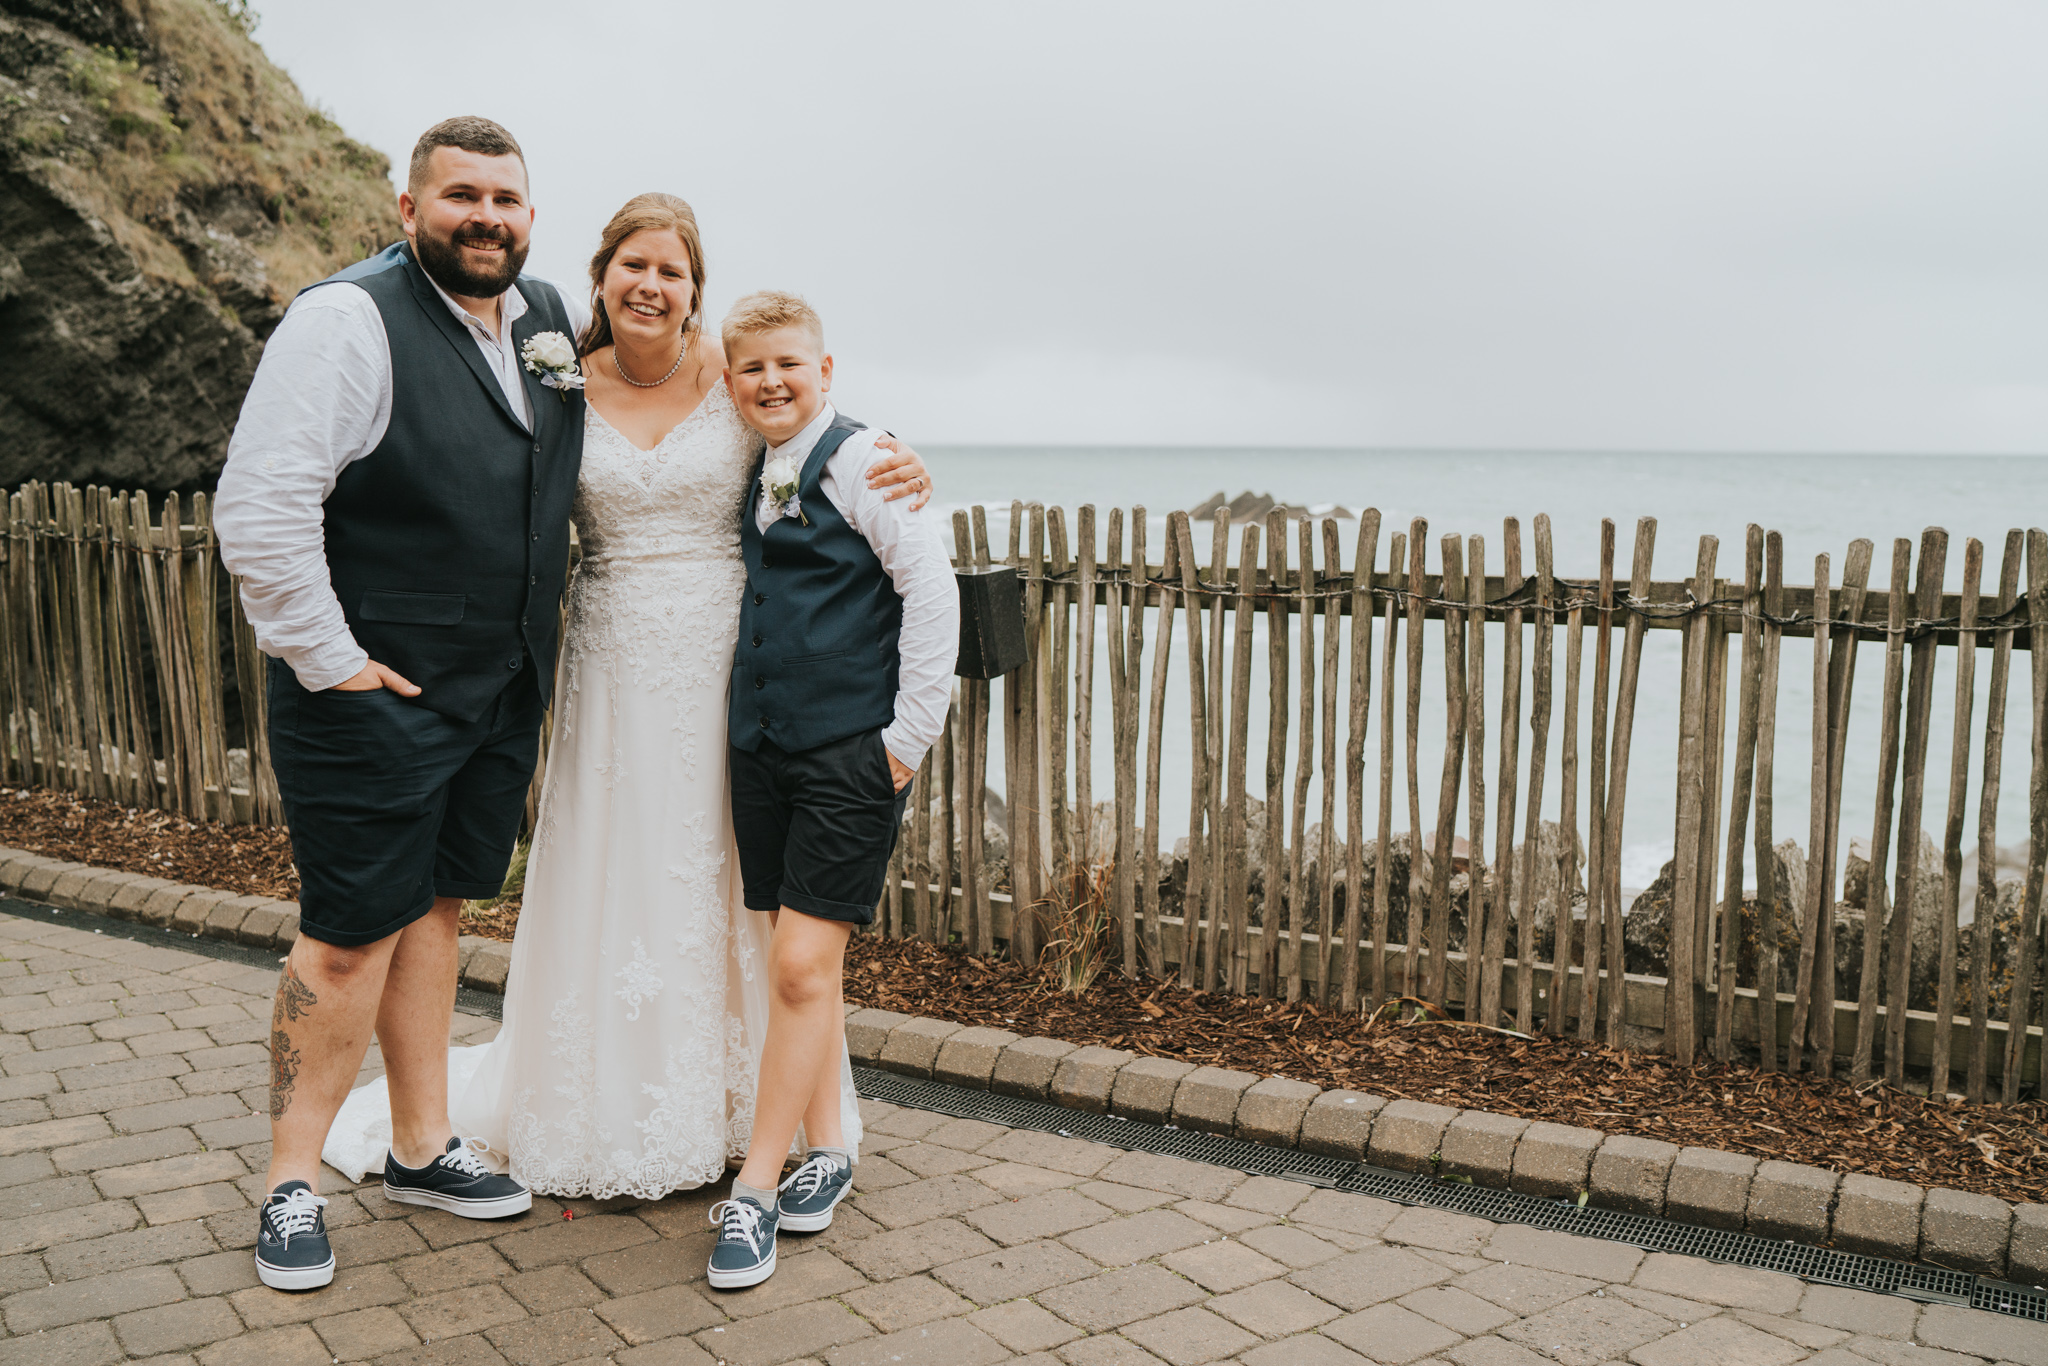 john-amy-relaxed-beach-wedding-tunnels-beaches-ilfracombe-north-devon-grace-elizabeth-colchester-essex-alternative-relaxed-wedding-photography-devon-suffolk-norfolk-essex (131 of 159).jpg